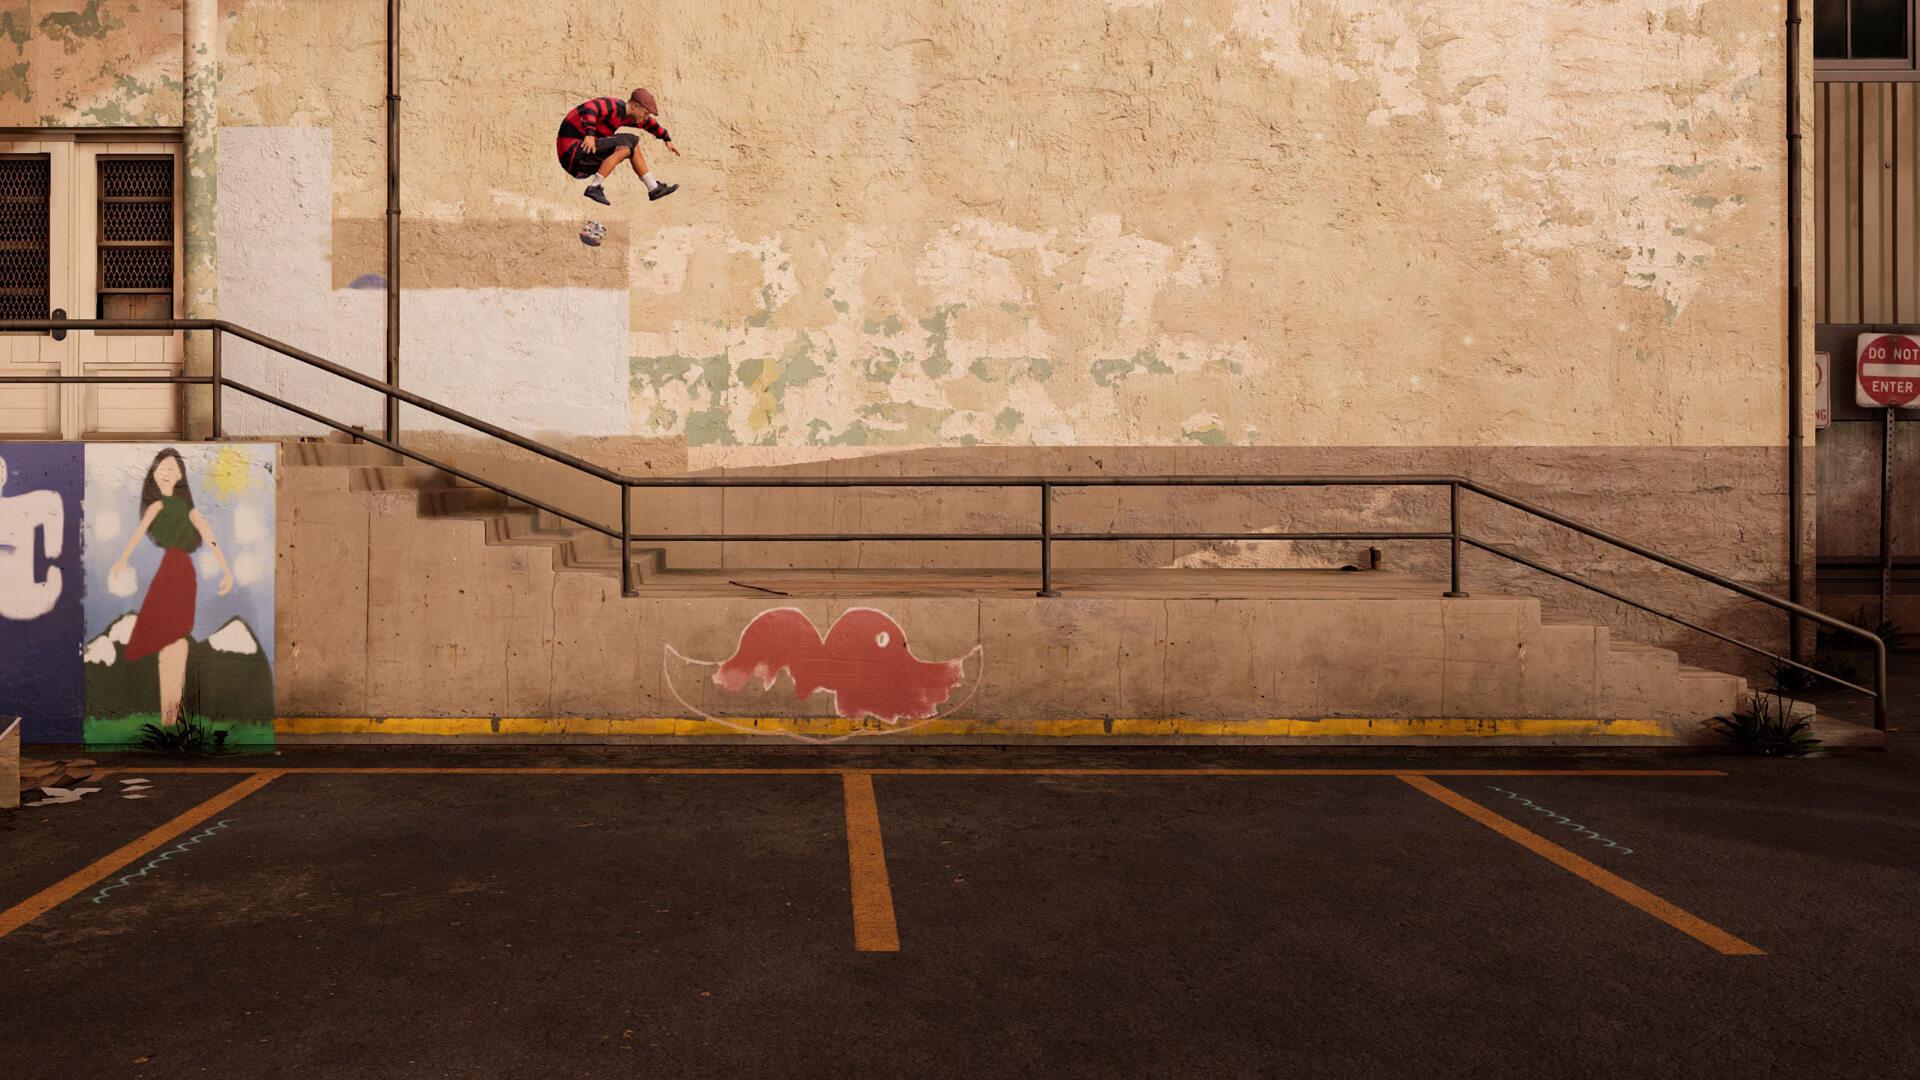 tony hawks pro skater 1 and 2 desktop wallpaper 71837